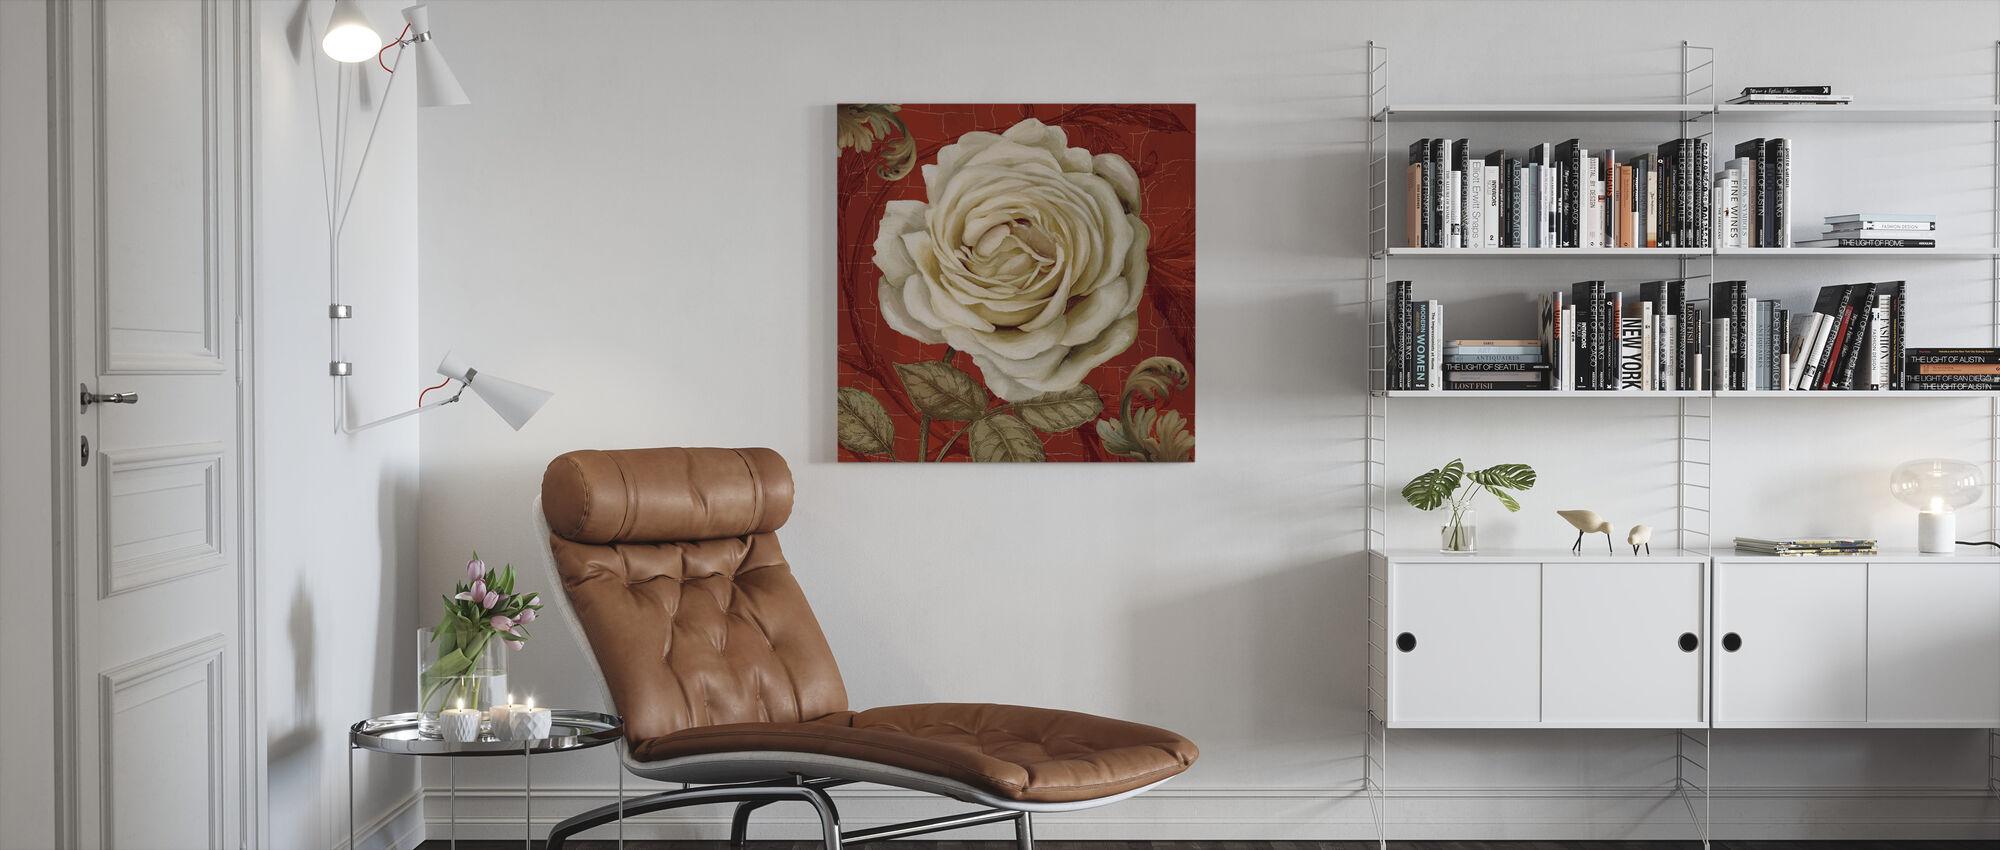 Rode Bourgeoisie 2 - Canvas print - Woonkamer